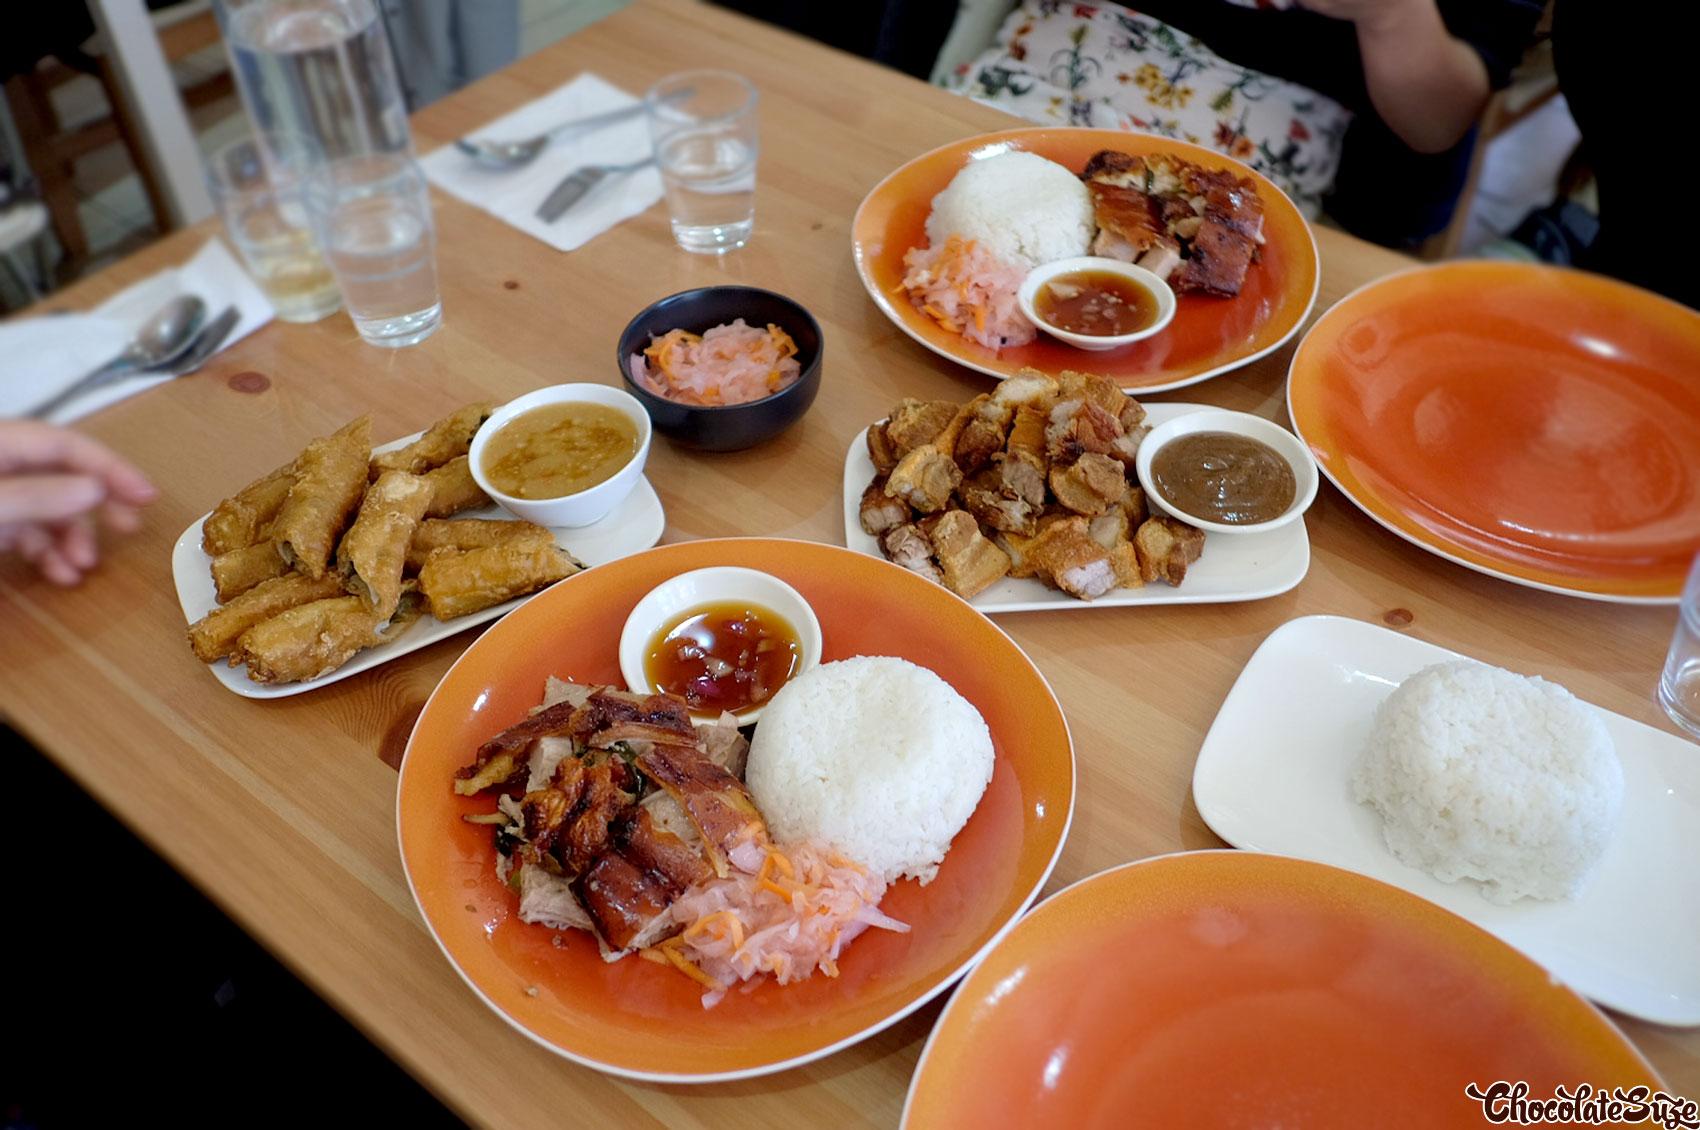 Table of food at Sydney Cebu Lechon, Newtown